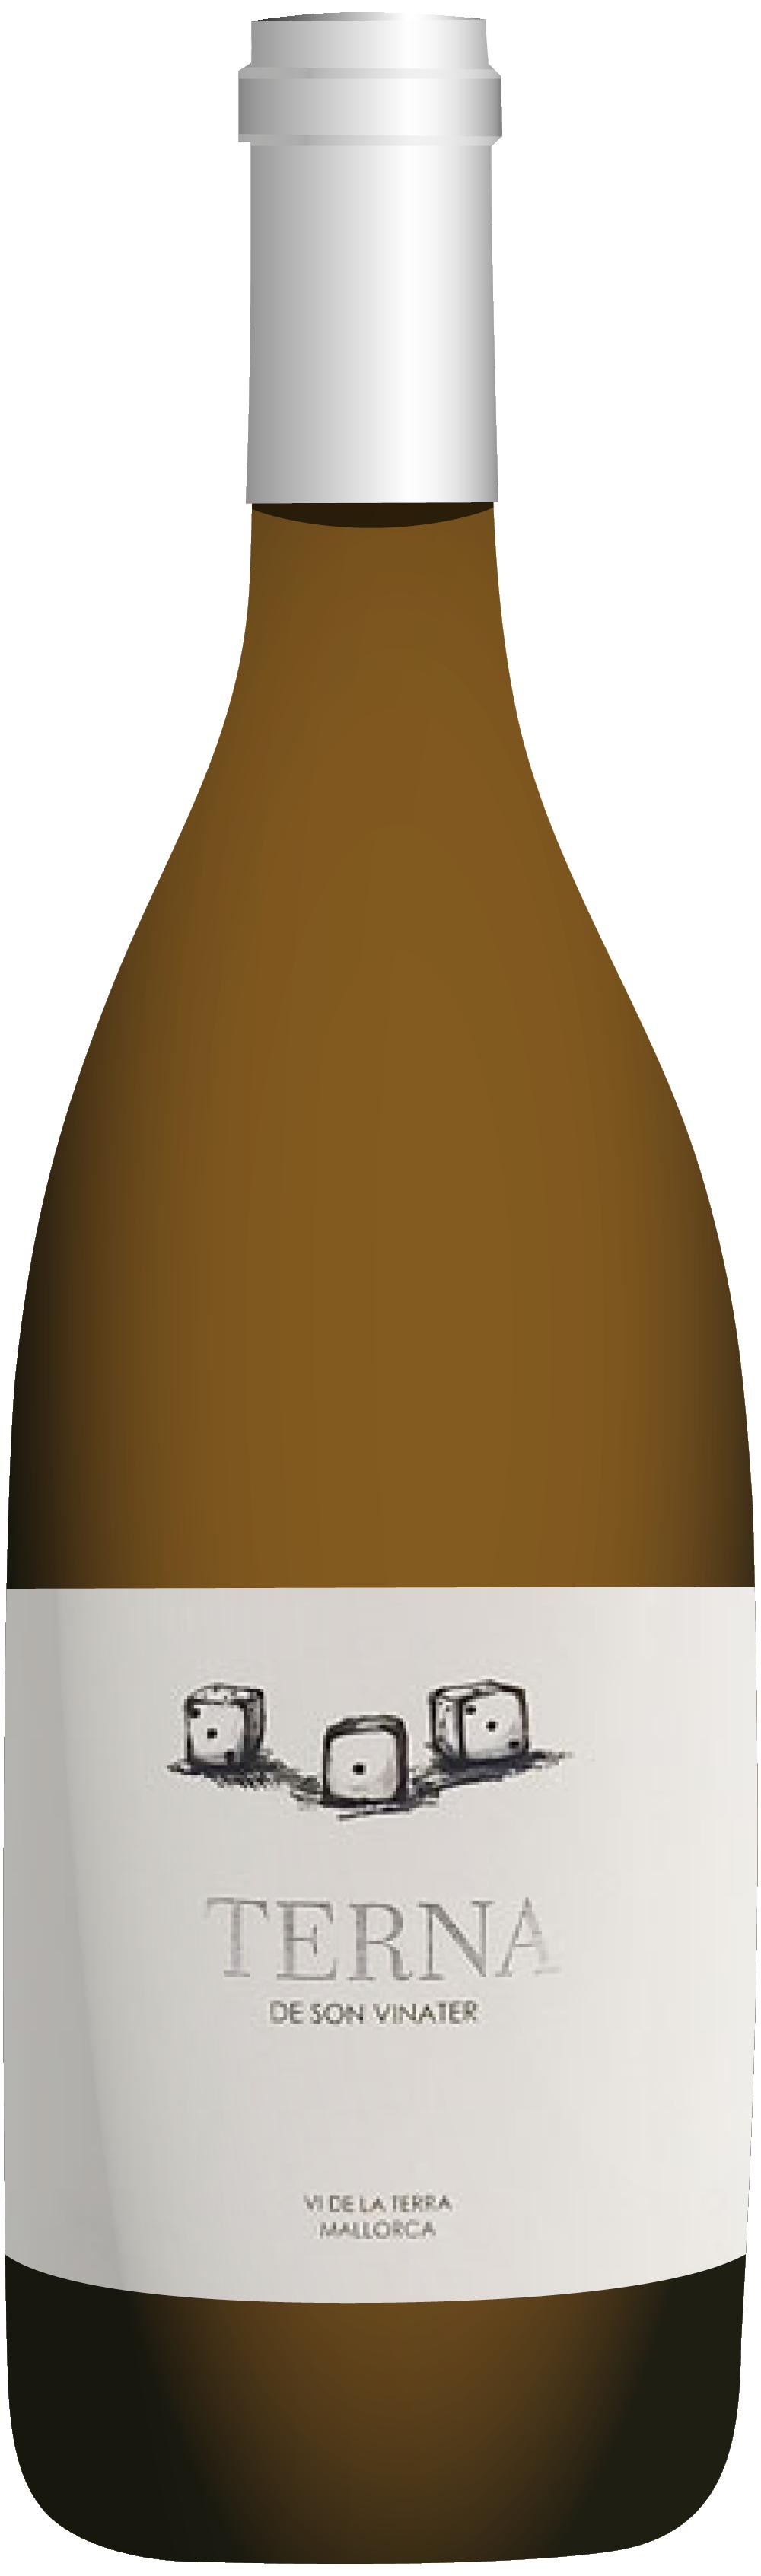 the natural wine company club march 2021 spain mesquida mora terna